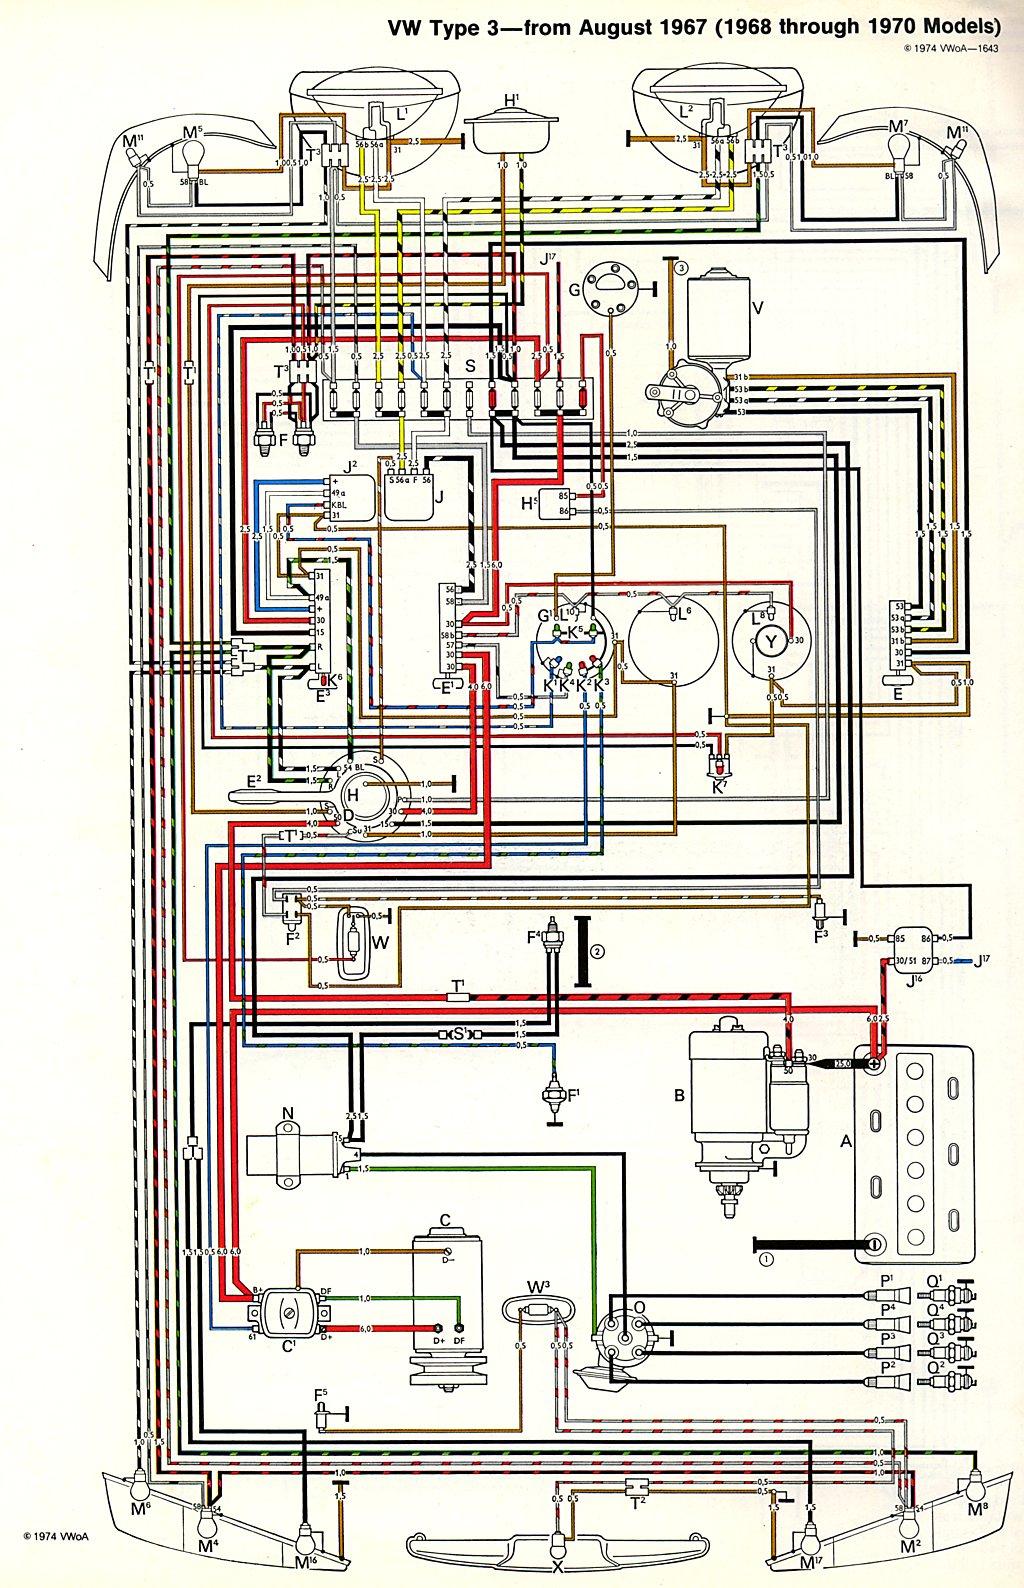 Wiring Diagram For Vw Transporter T5Wiring Diagram